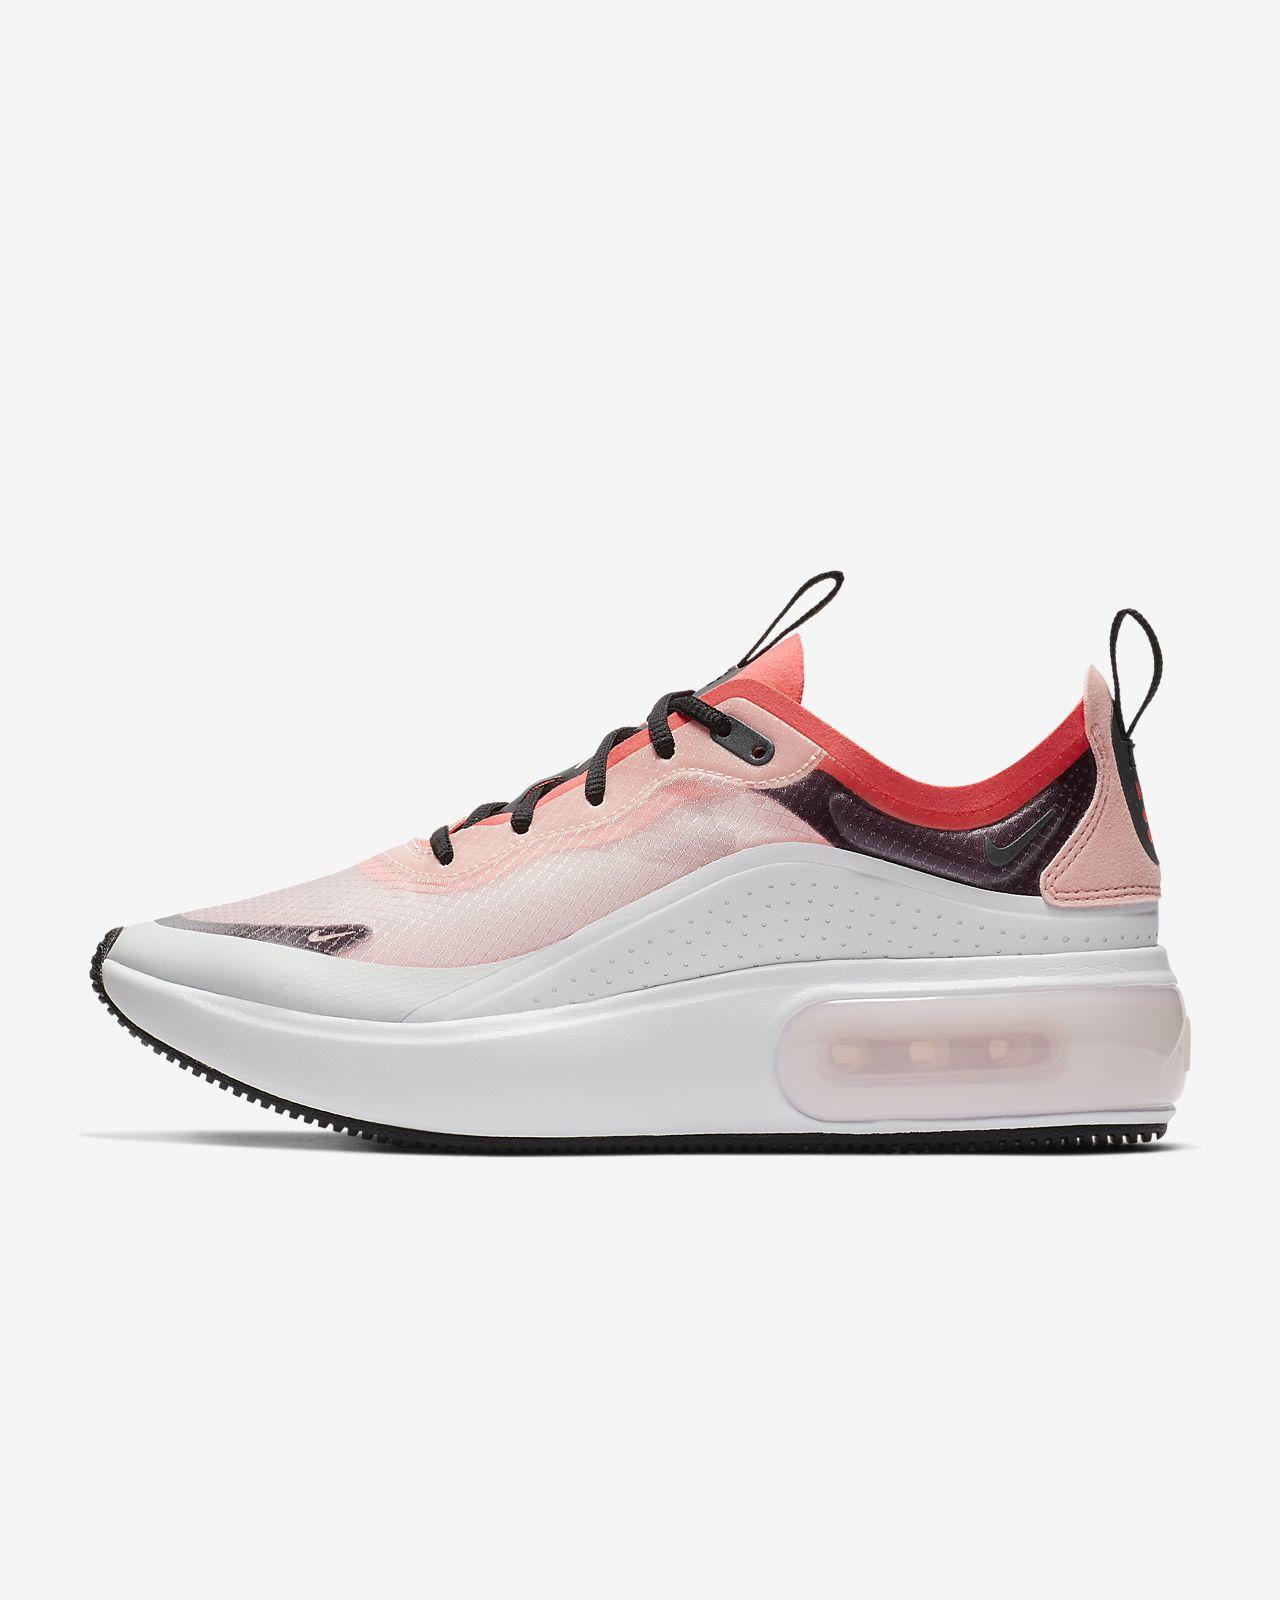 lowest price 1962f cc888 ... Nike Air Max Dia SE QS-sko til kvinder